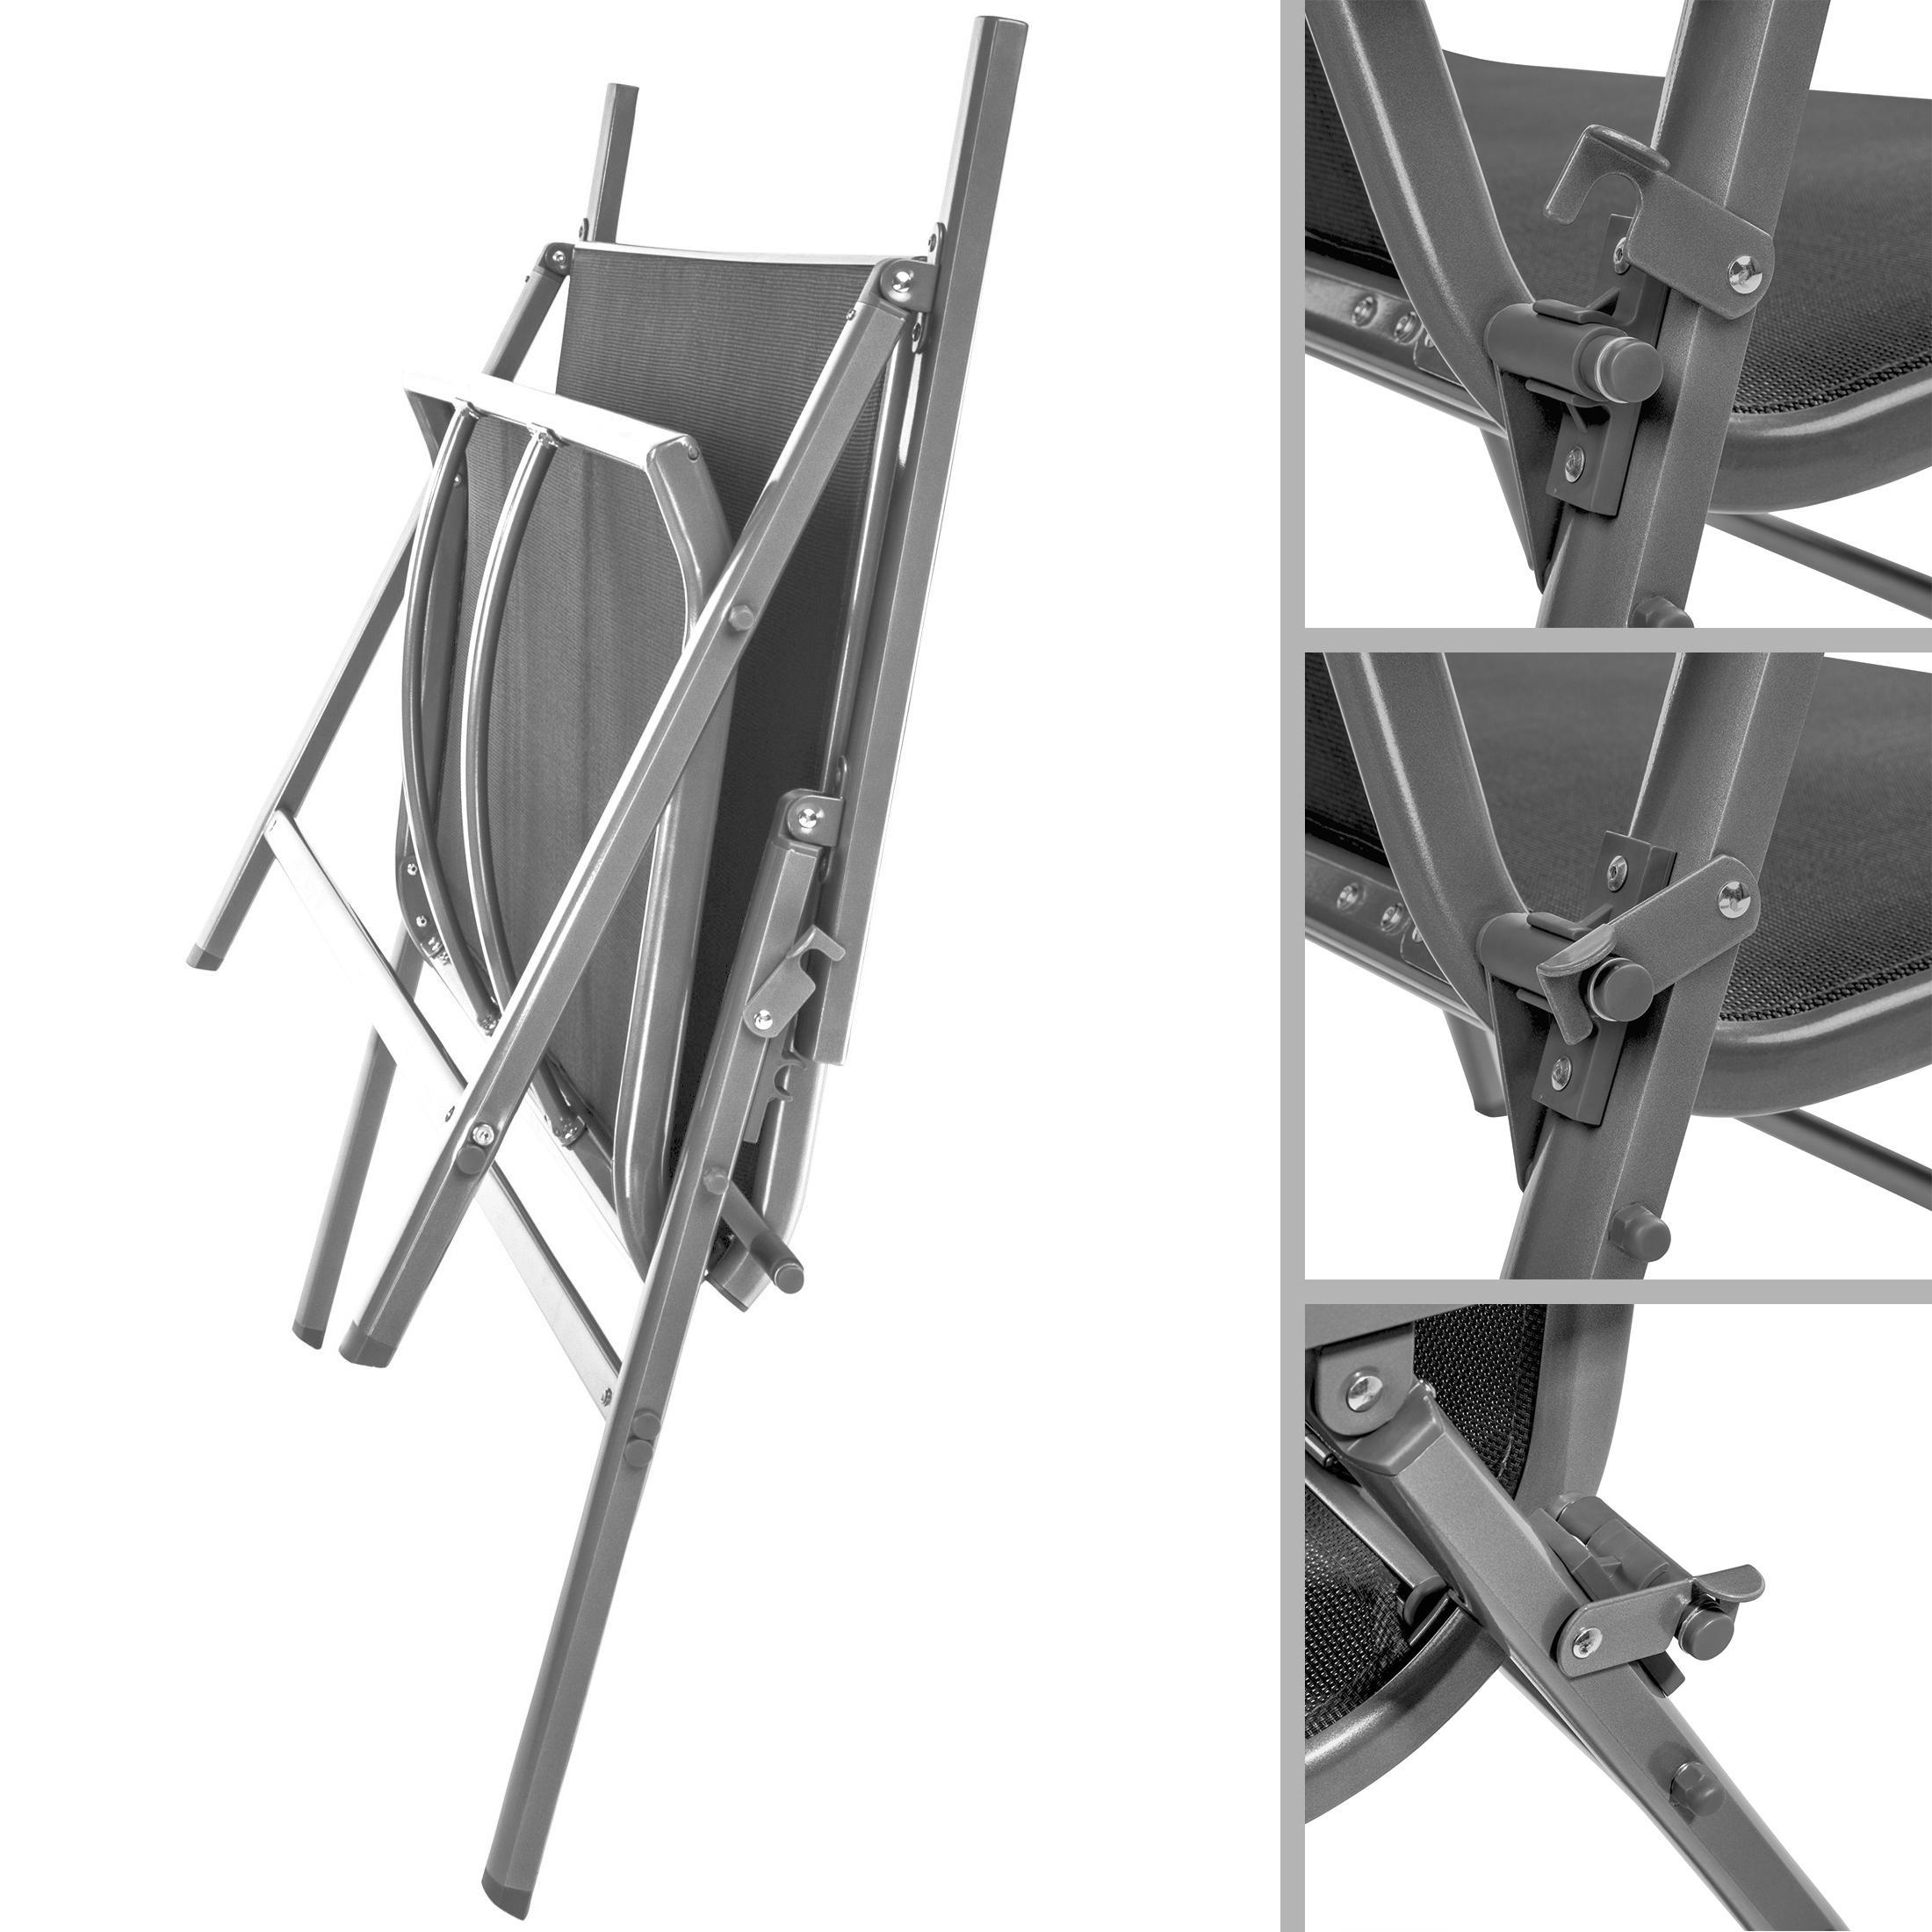 Gartenmobel Rattan Toom :  Ultranatura KorfuSeriePlus, Aluminium Gartenbank mit Armlehne, Grau